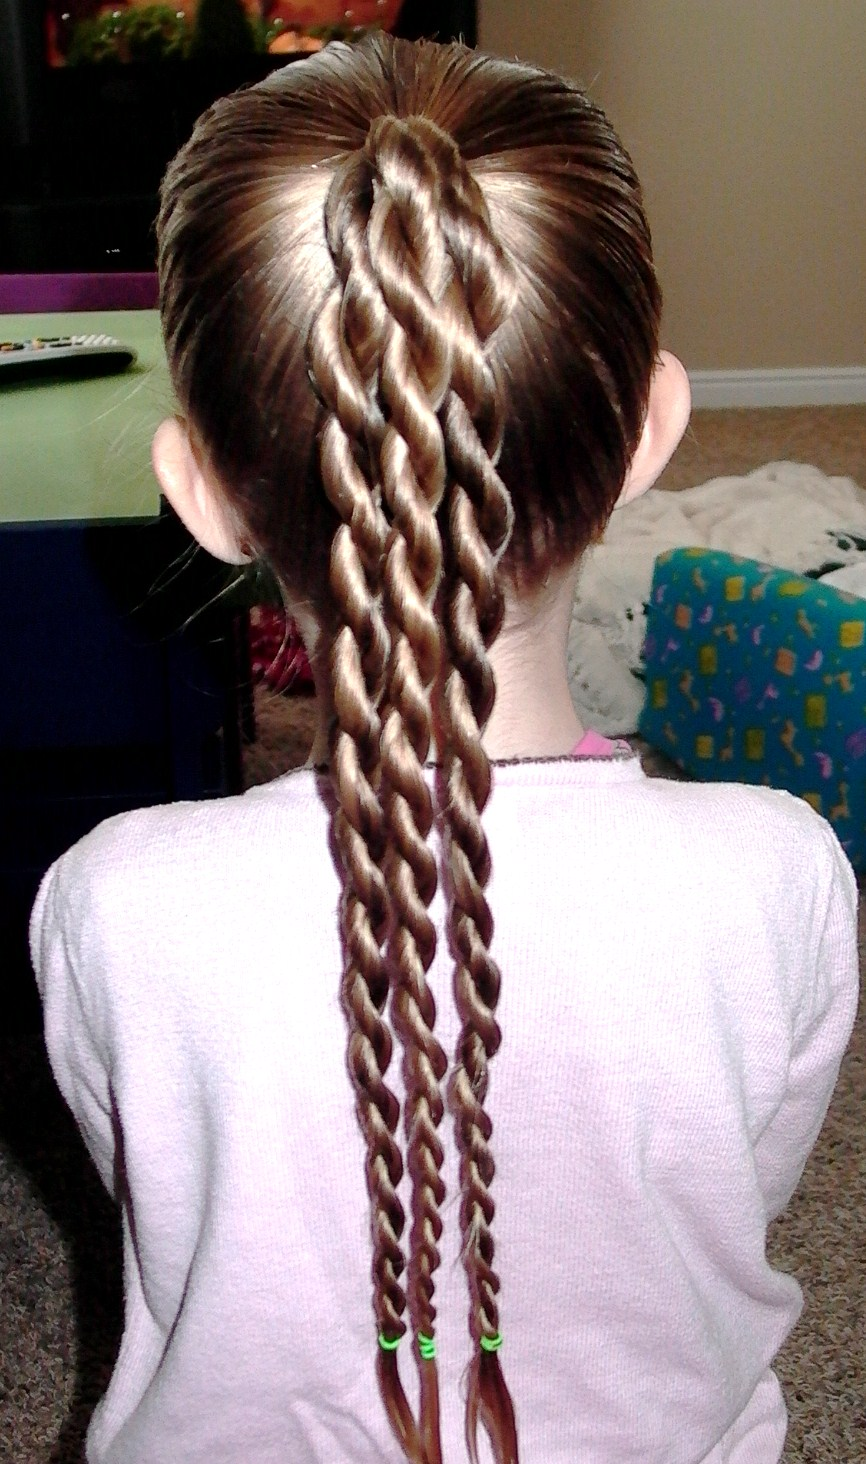 Little Girl's Hairstyles: St. Patrick's Hairdo: The Shamrock Hairdo - Pretty Hair is Fun - Girls ...